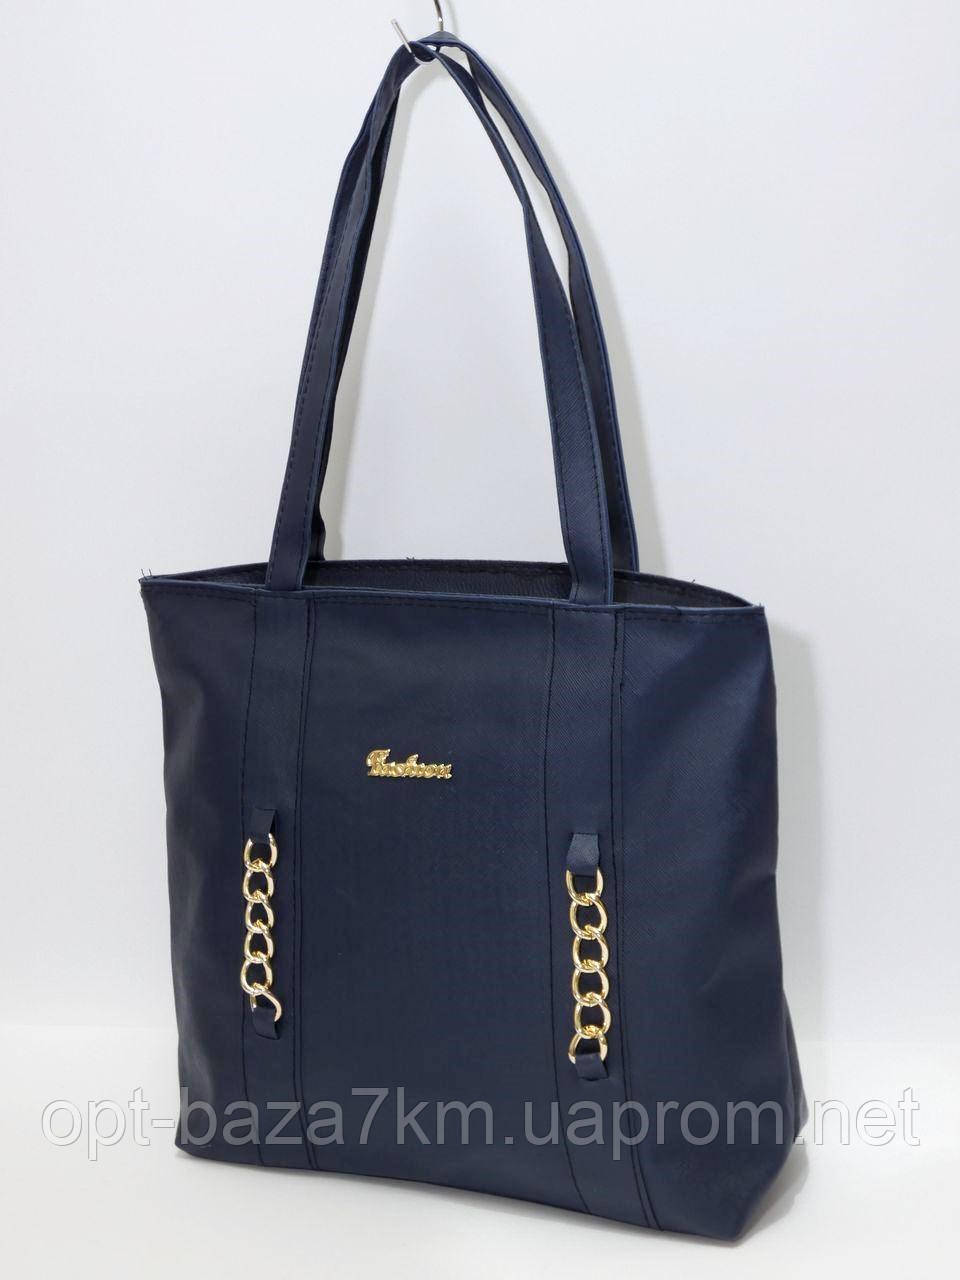 8a95e262e428 Женская сумка (39х34х10), Турция - Интернет-магазин «Оптовая База 7 км